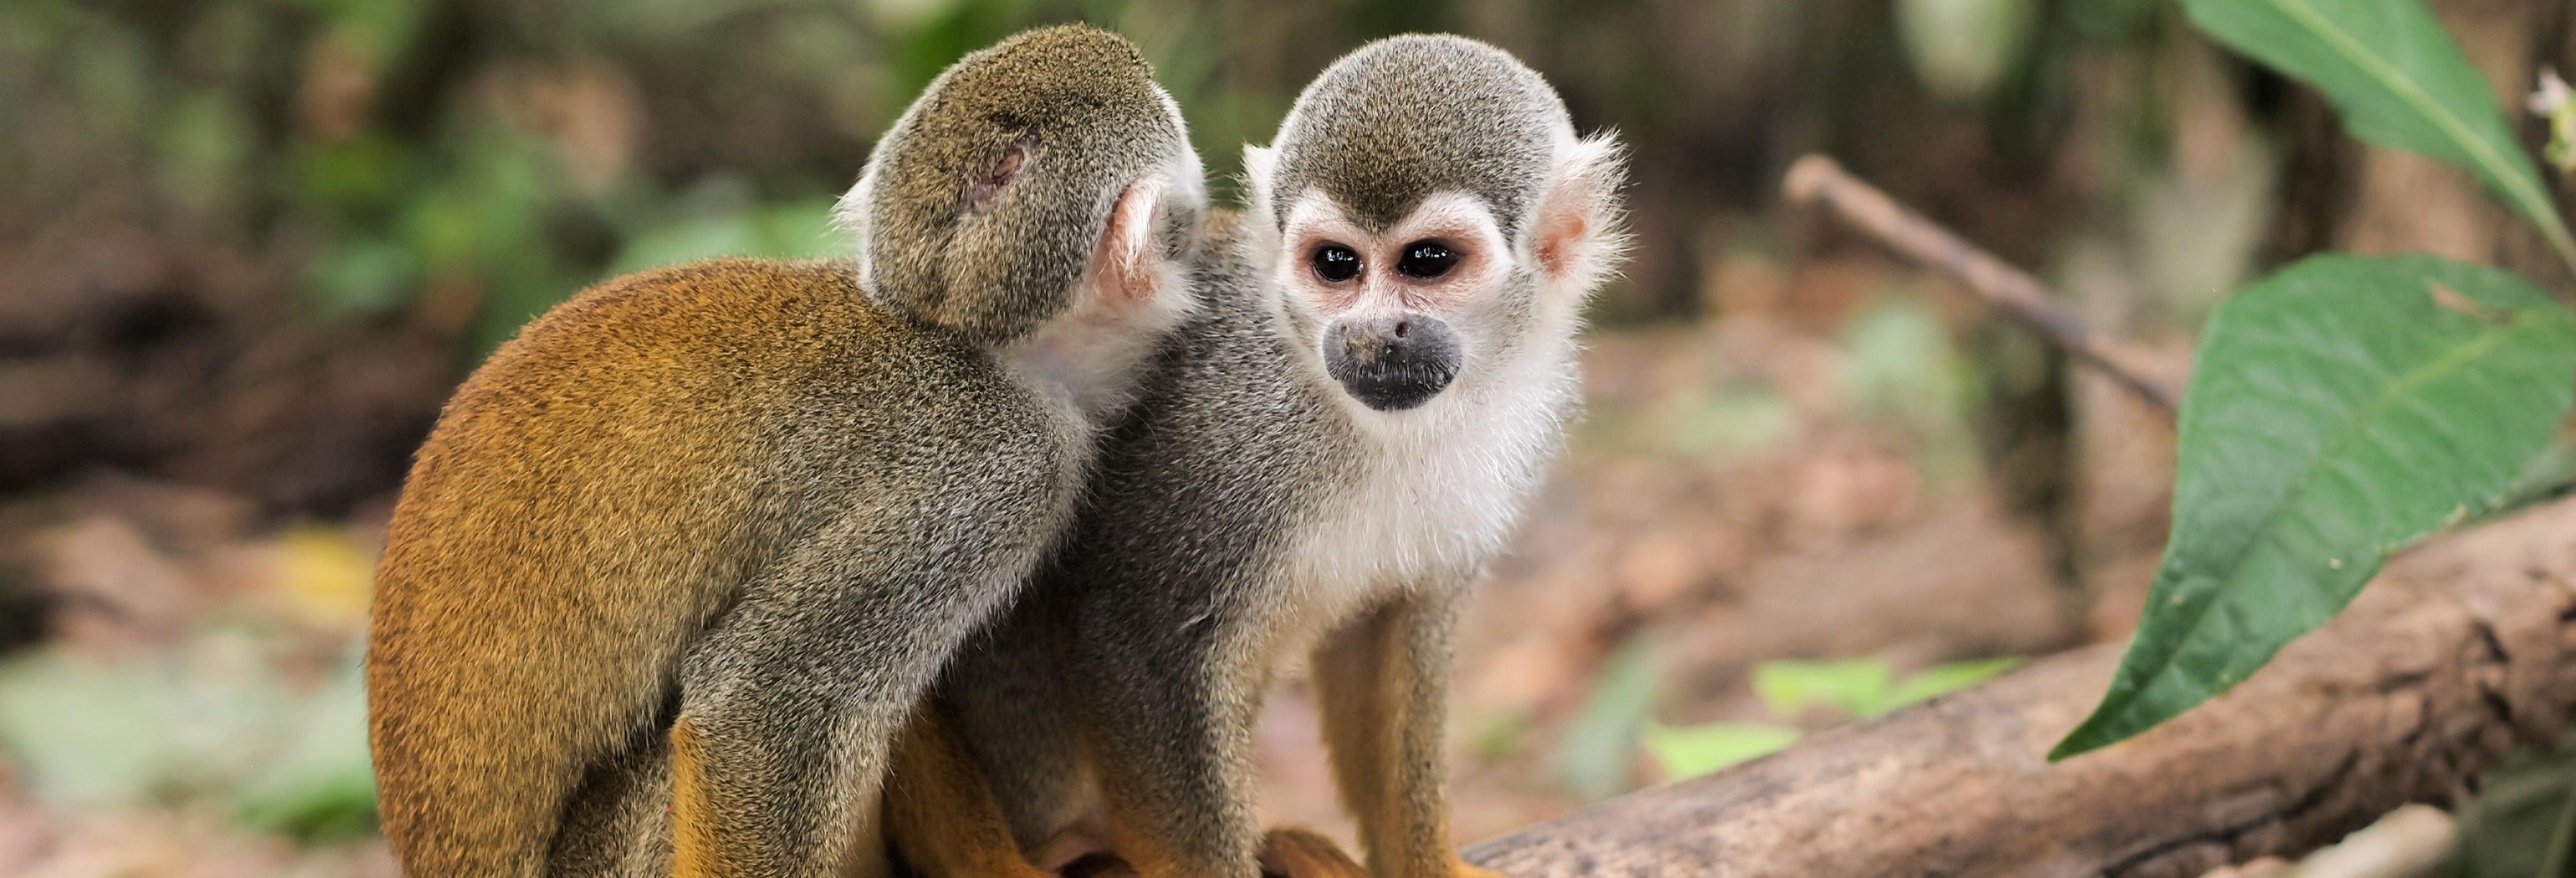 Tour en kayak + Isla de los Monos